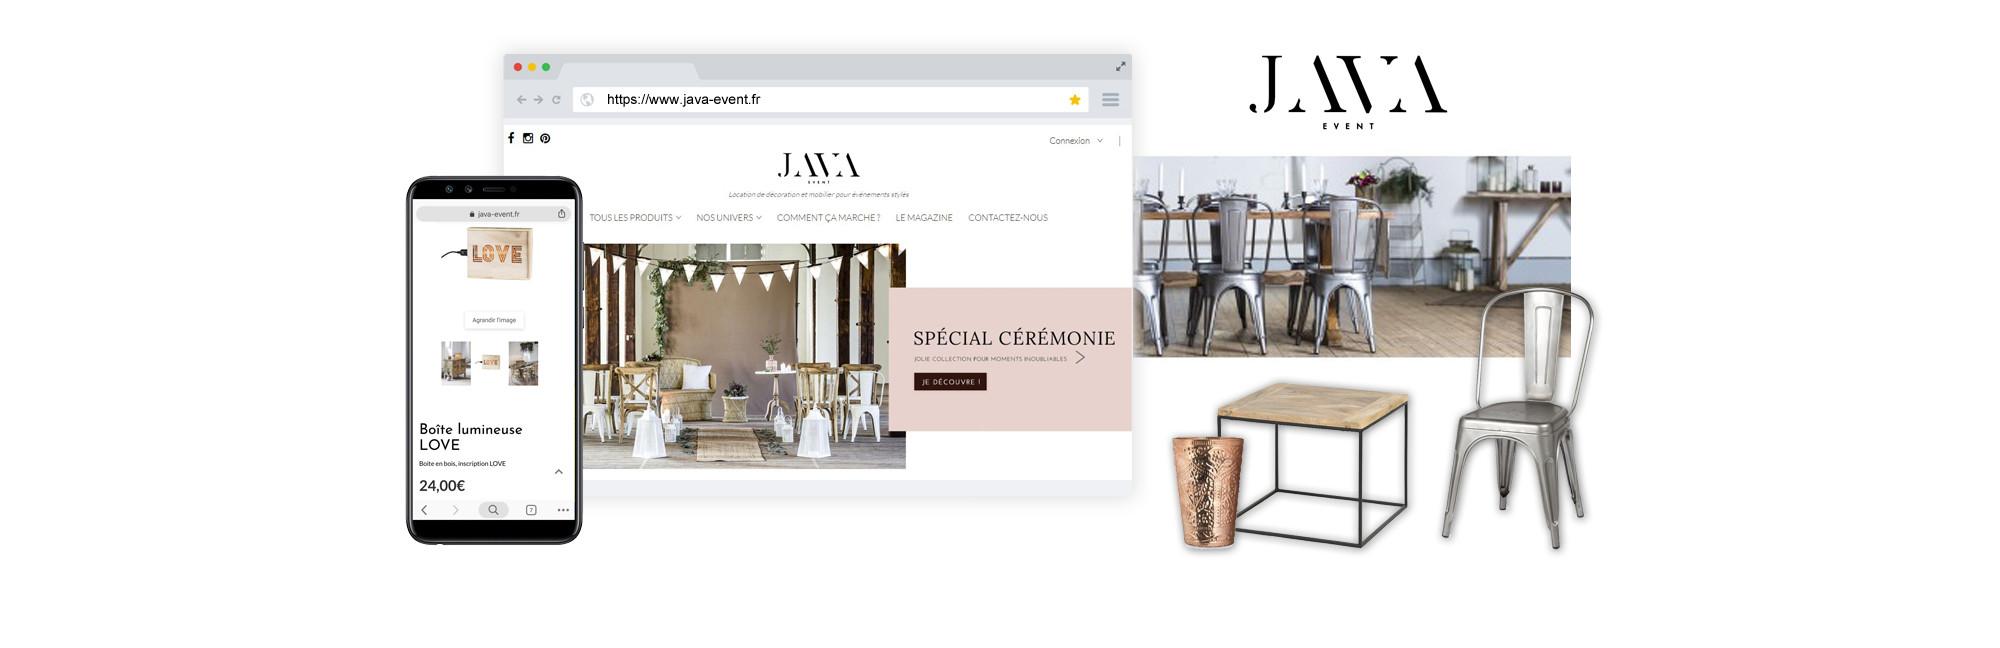 Java Event